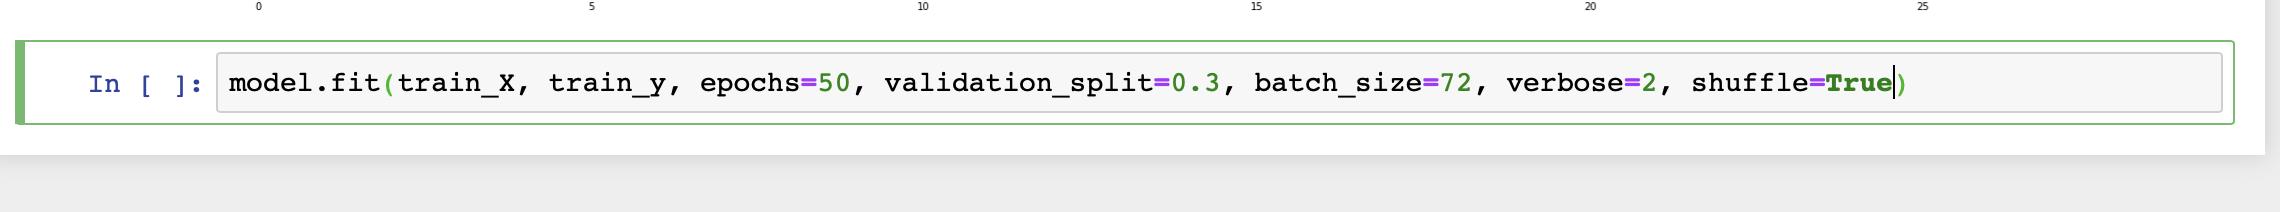 validation_split in model.fit(keras)